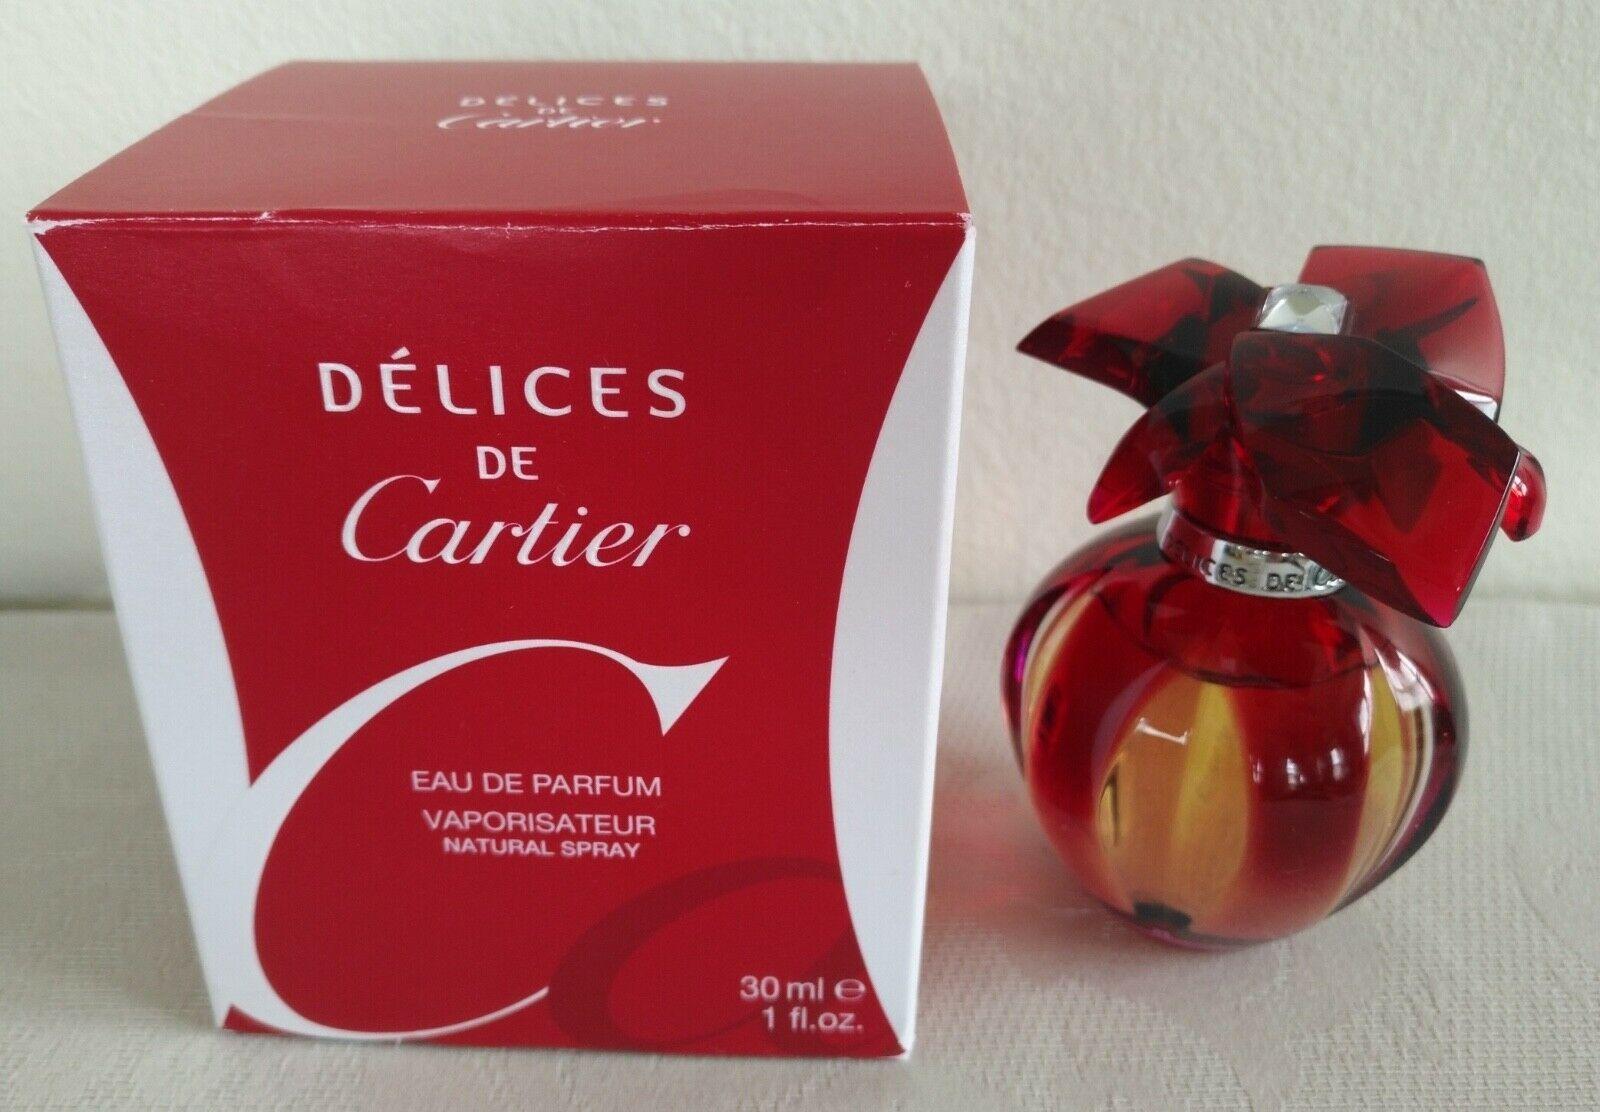 Cartier delices de cartier 1.0 oz perfume